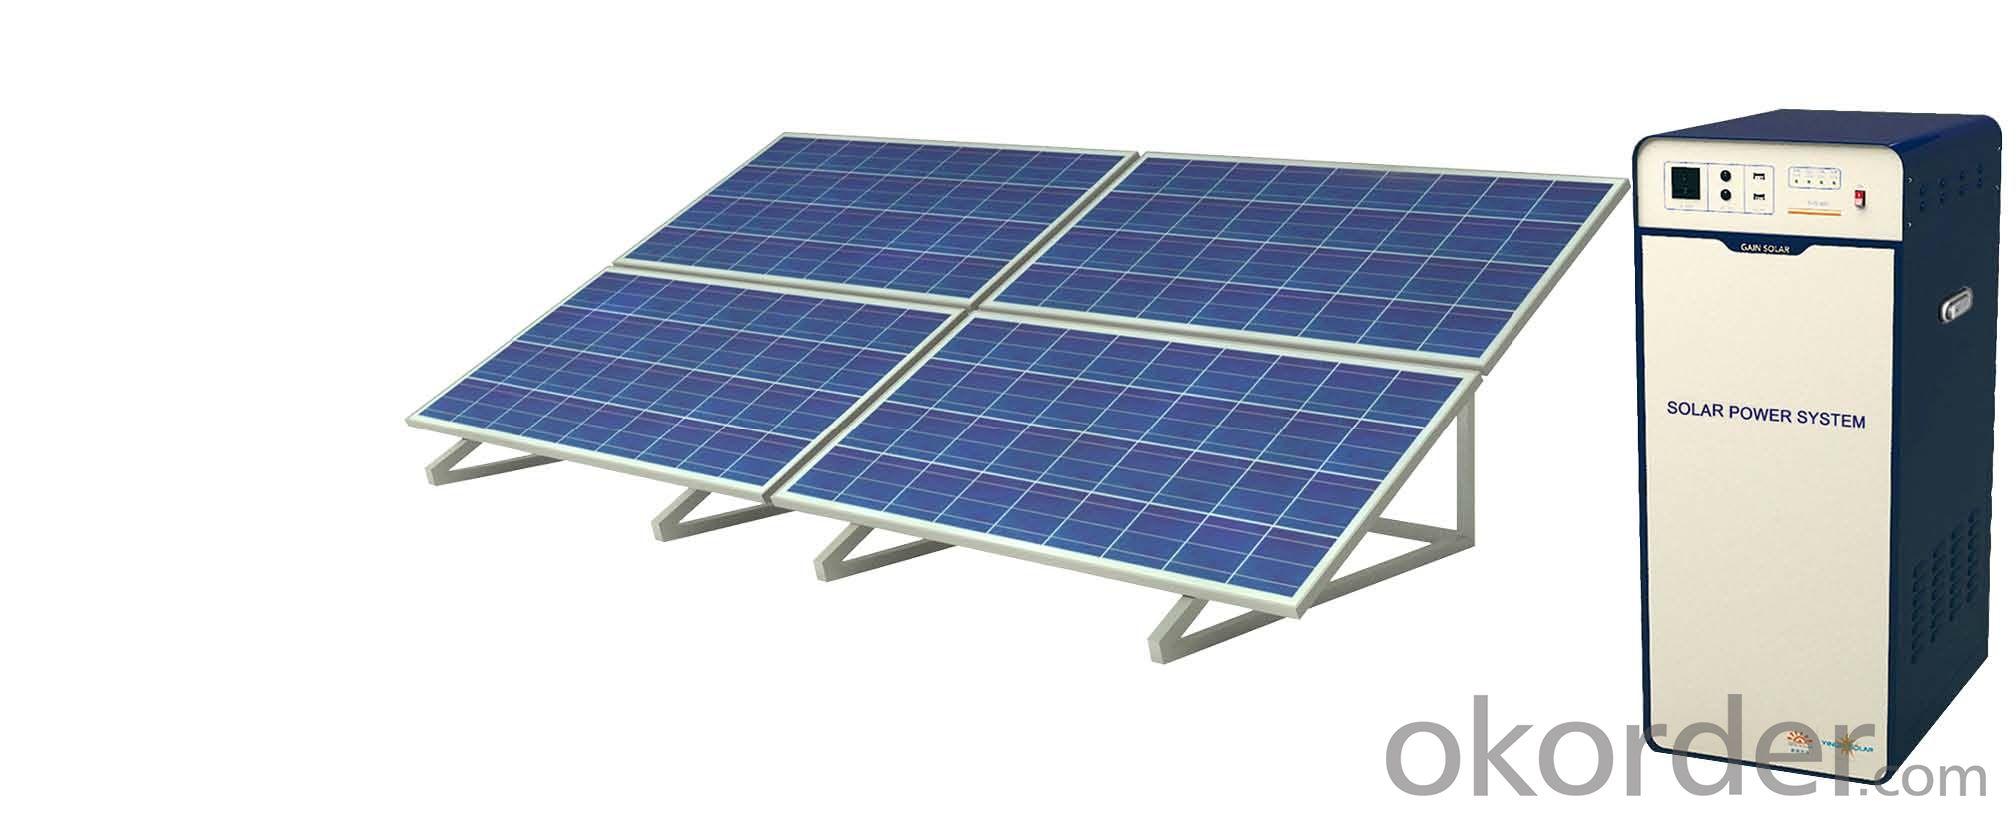 Off-grid Solar Power System JS-SPS-1000